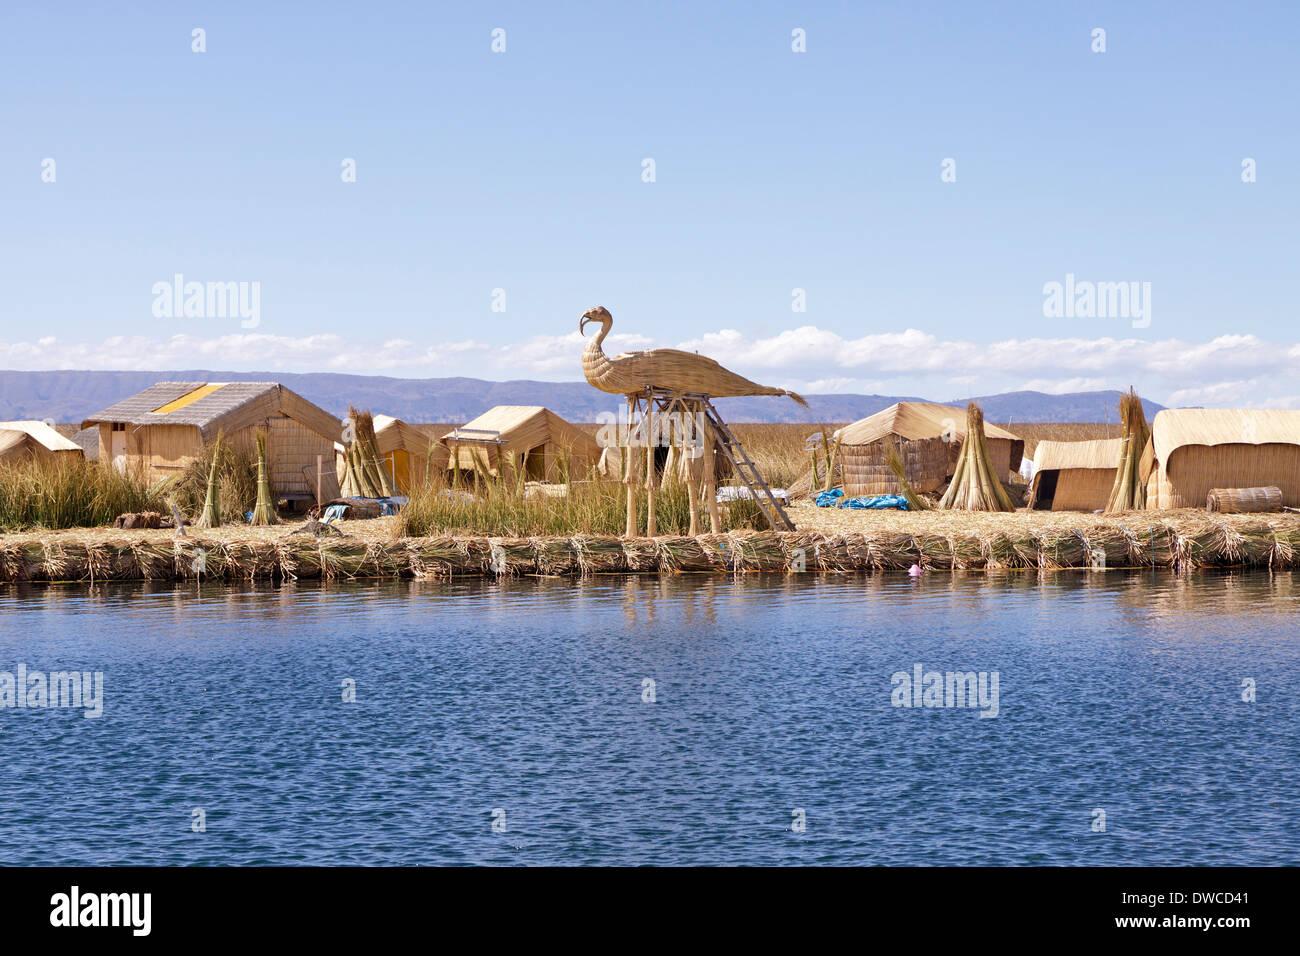 floating Uro Island, Lake Titicaca, Puno, Peru, South America - Stock Image